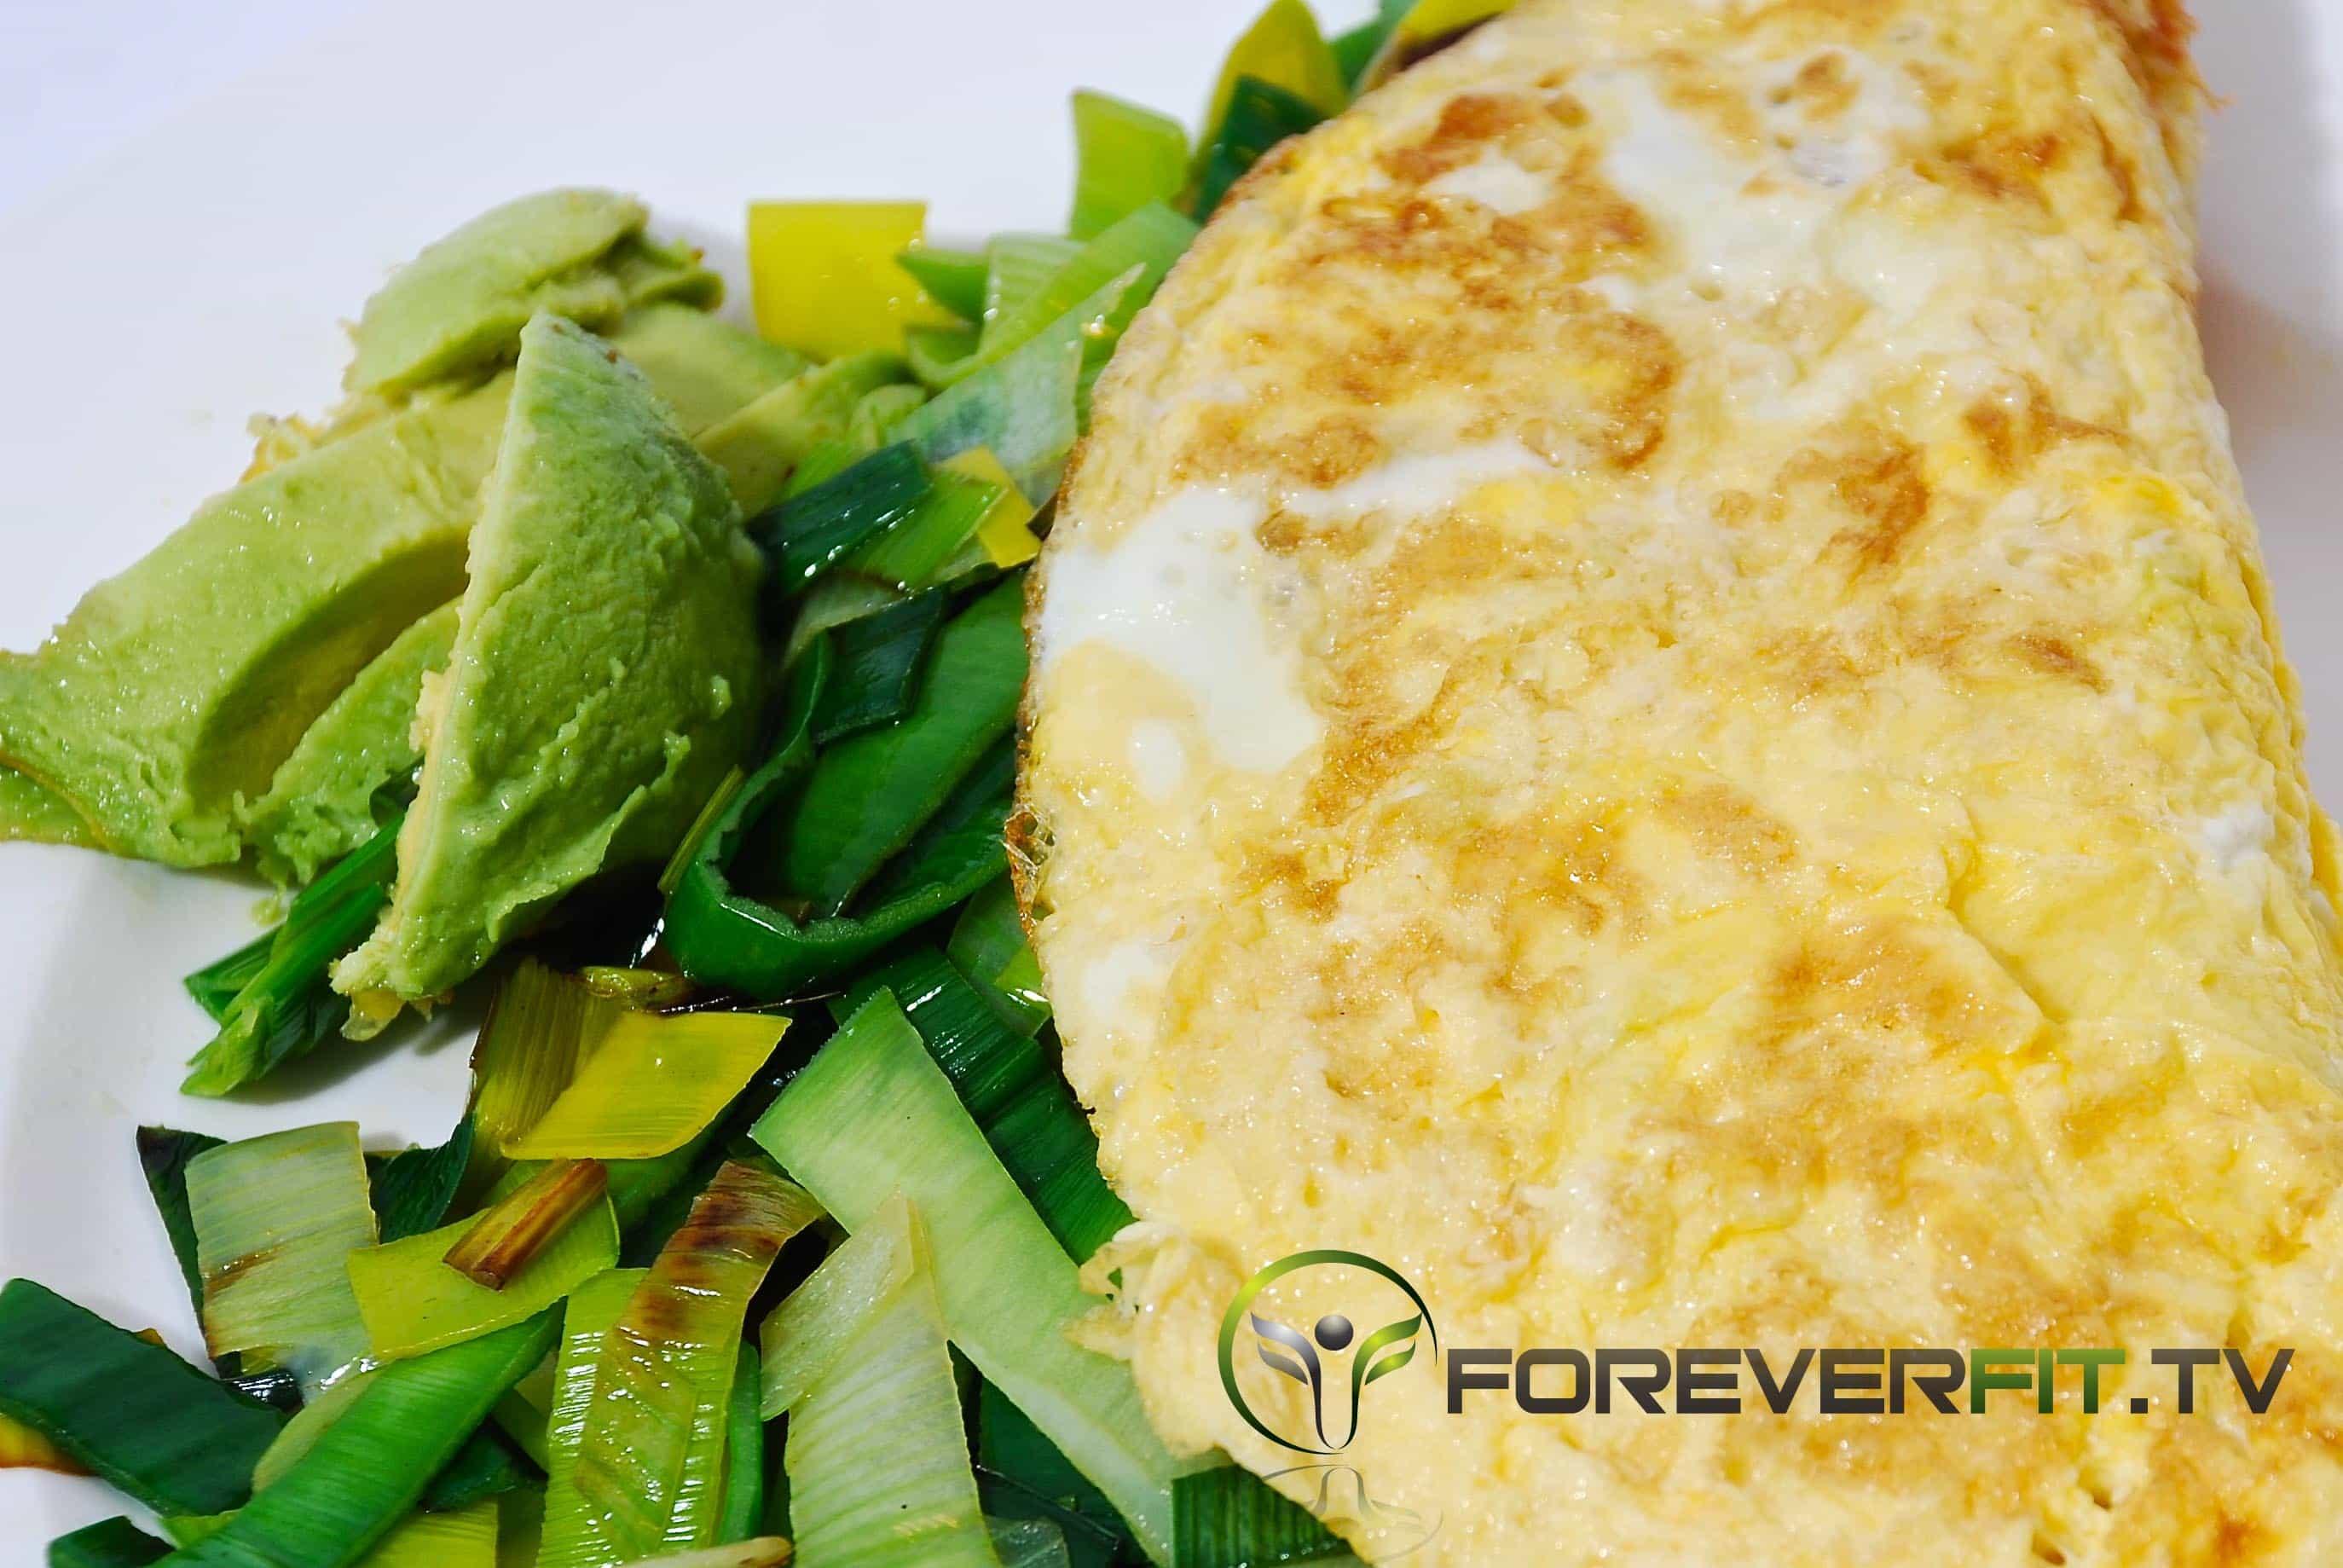 Omelette copy